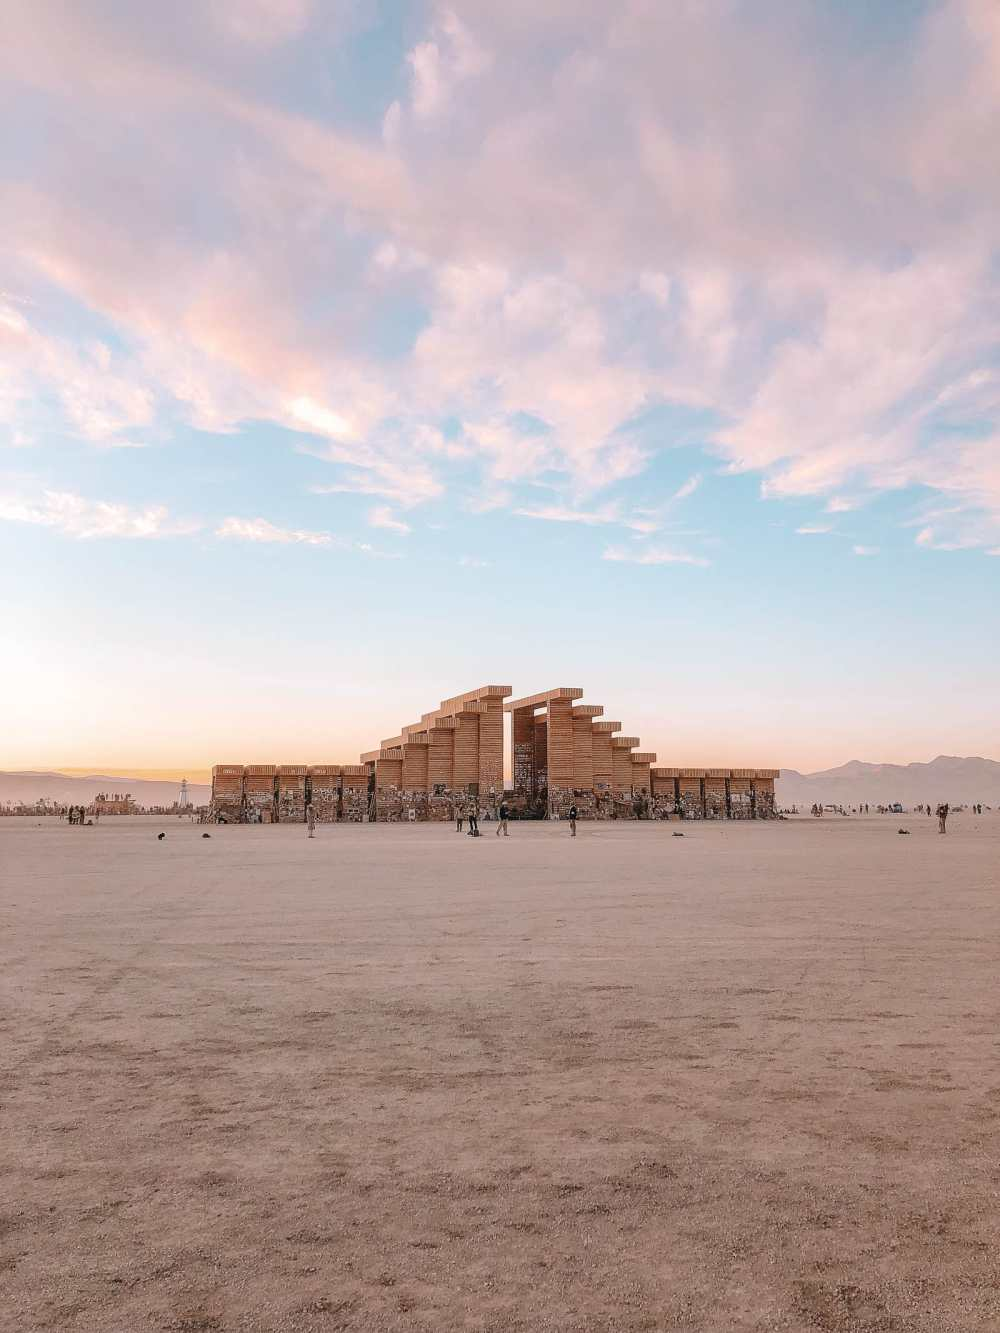 Руководство для новичков по Burning Man (39)